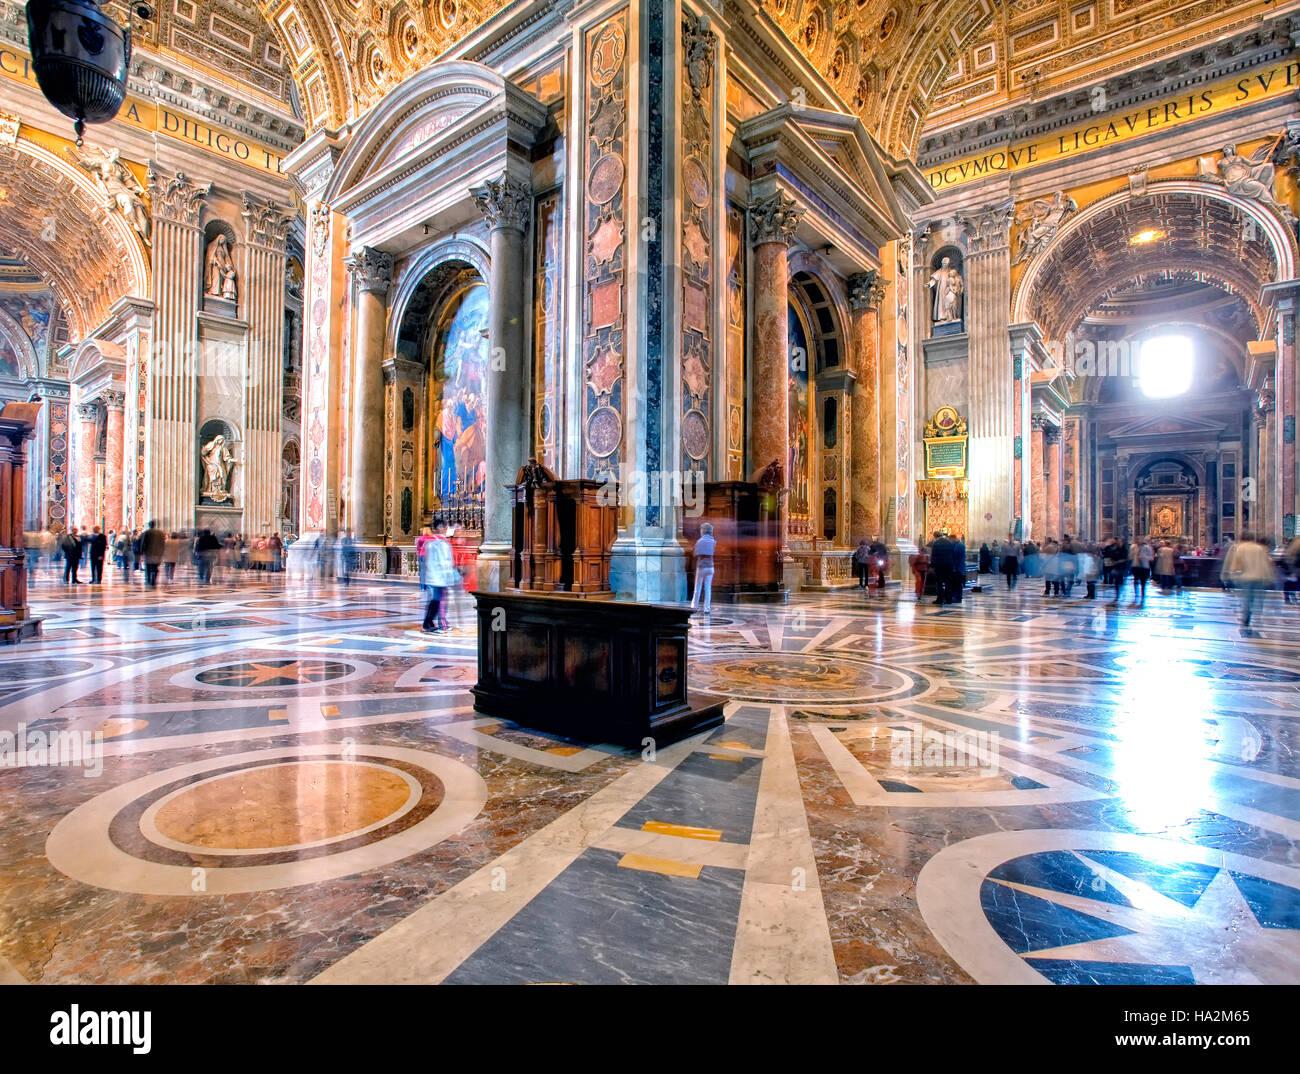 Interior de la Basílica de San Pedro en Roma, Italia Imagen De Stock